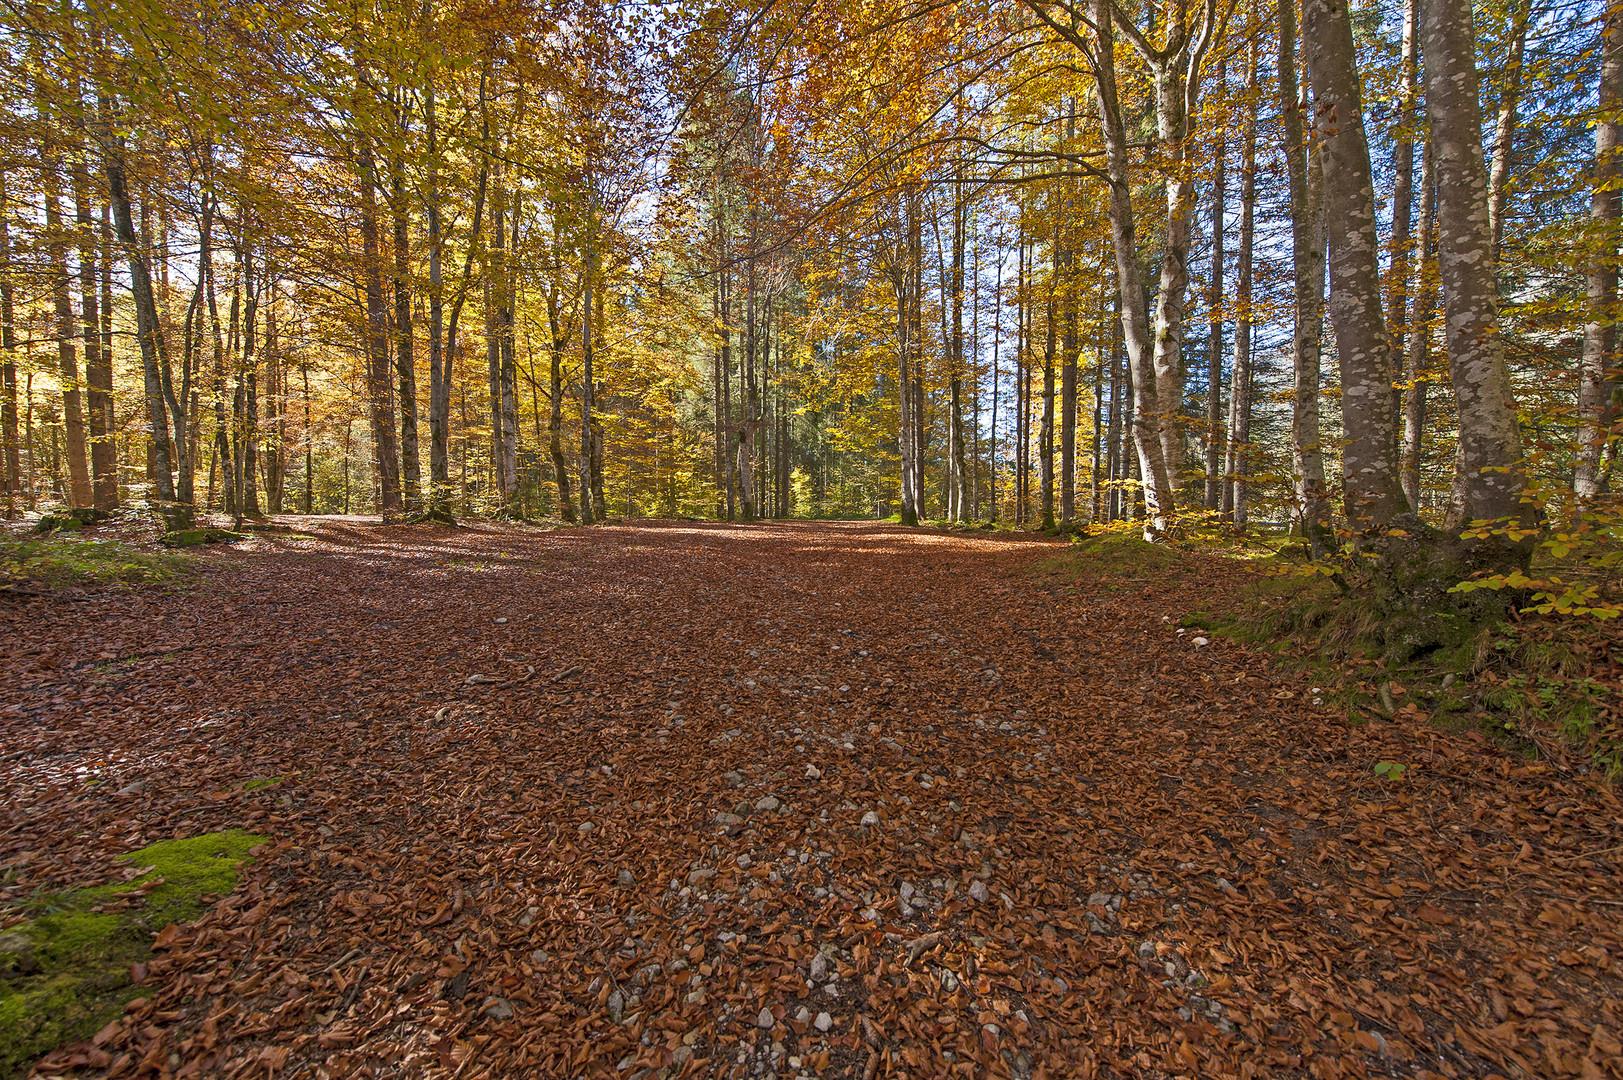 Herbstwege